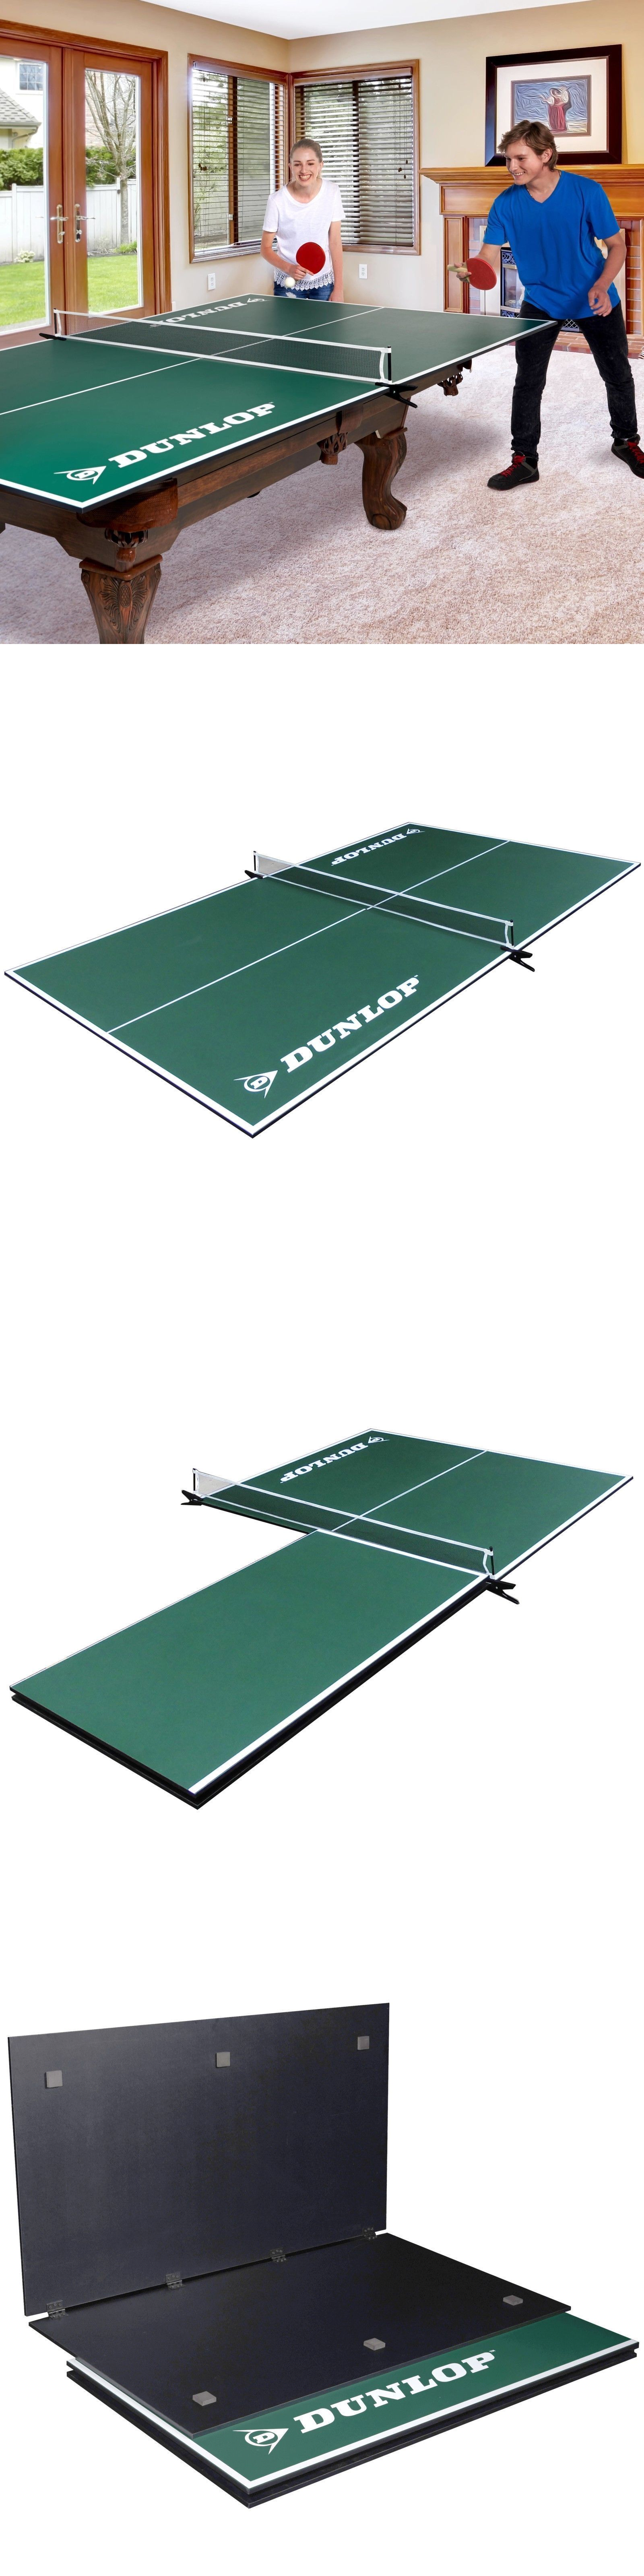 a298a732e42 Sets 158955  Dunlop Official Size Table Tennis 4-Piece Conversion Top  Premium Clamp Style